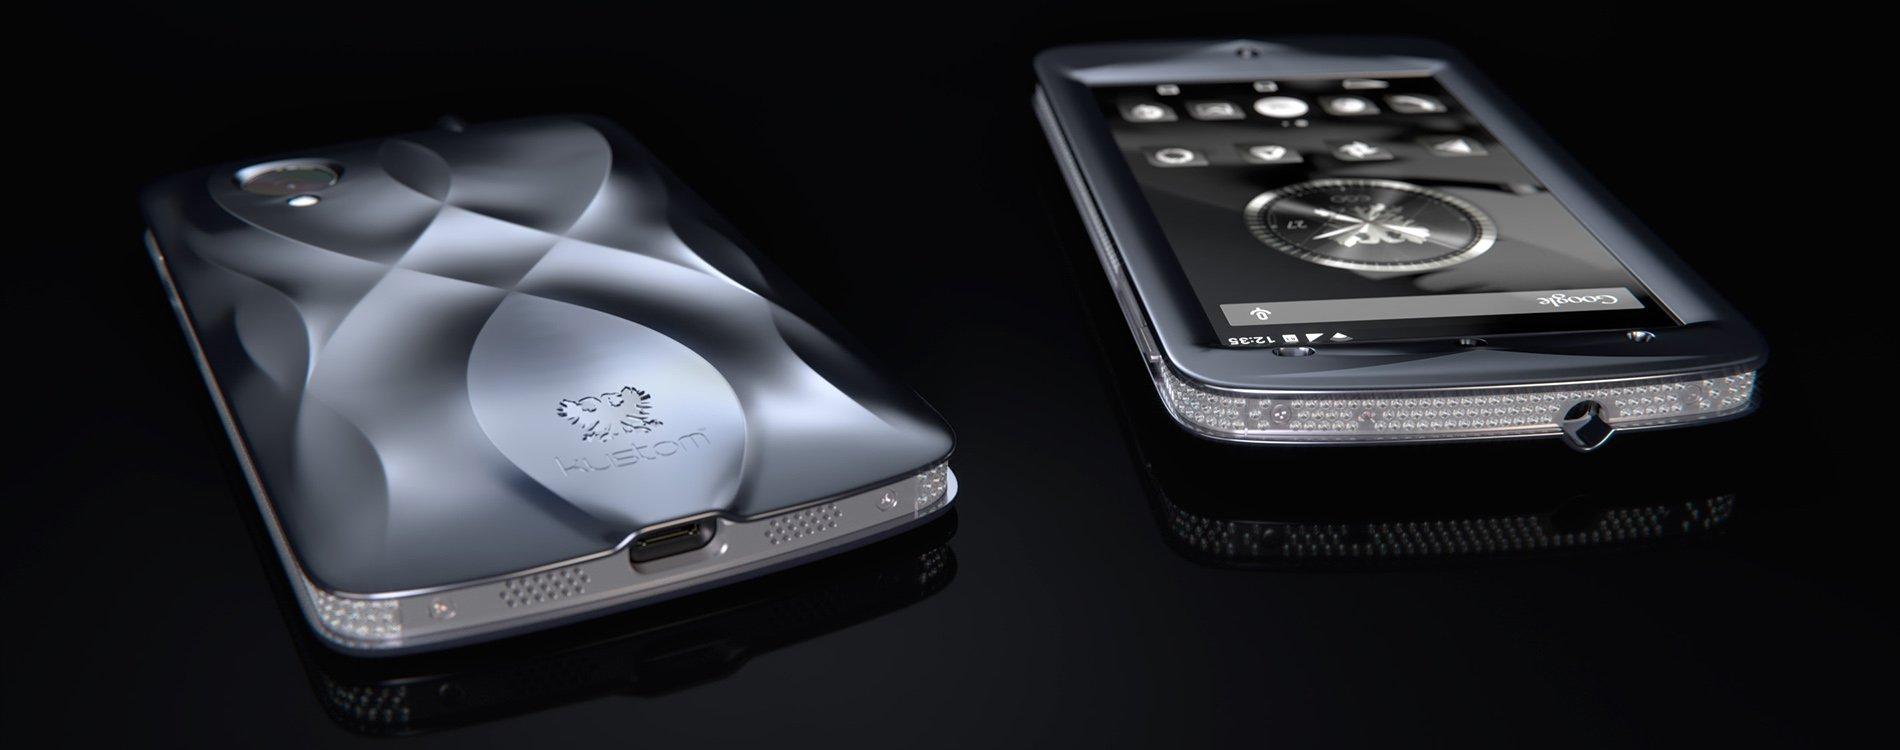 Nace EGO, el smartphone de gran lujo de KUSTOM